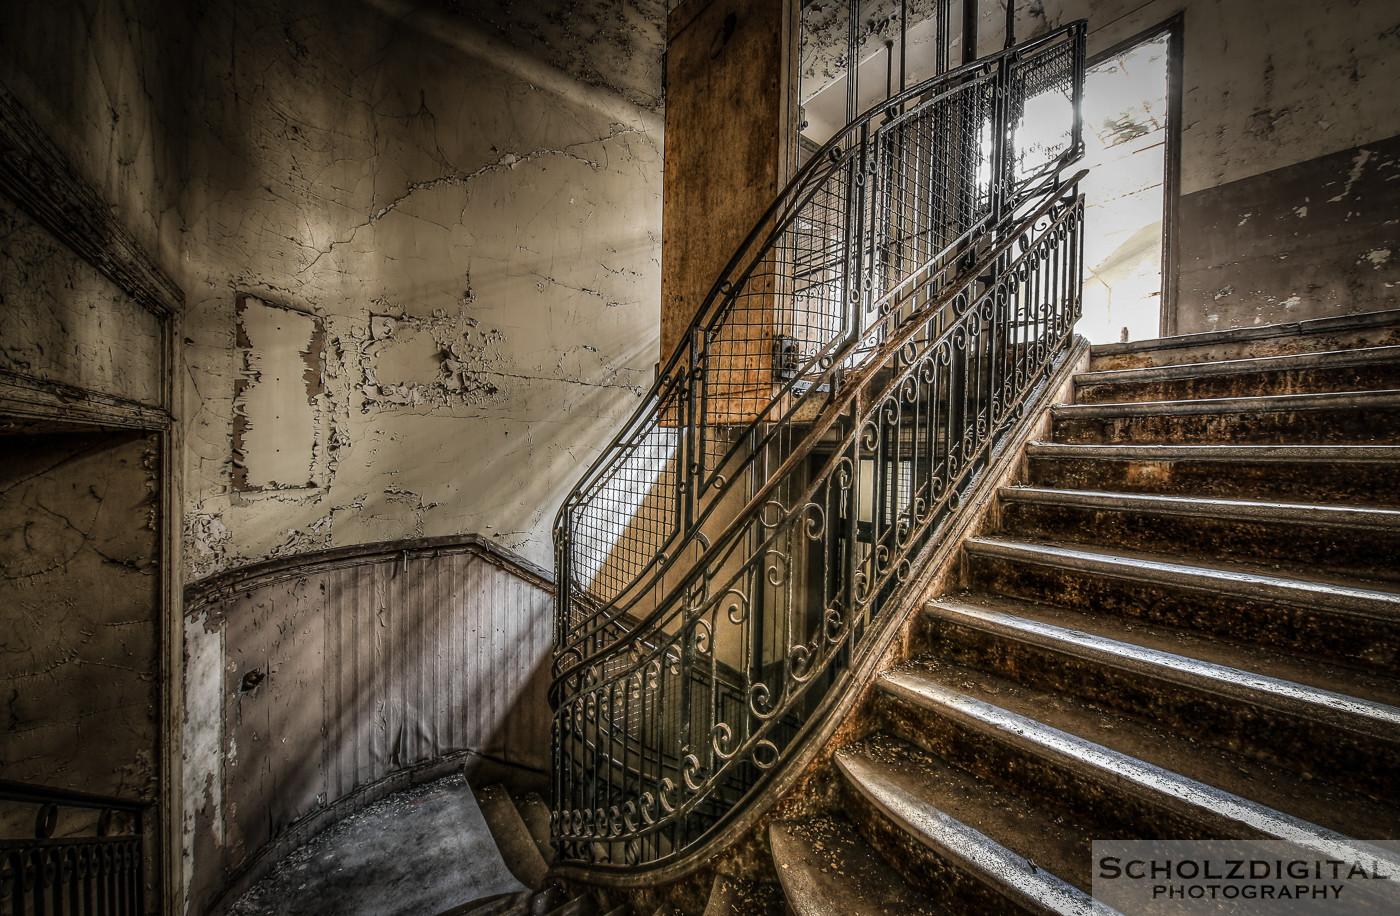 Abandoned, beelden, Bureau Central, Bureau Central De Wendel, Decay, forgotten, Lorraine, Lost Place, Lothringen, Urban exploration, Urbex, urbexlocatie, verlassen, Verlassene Orte